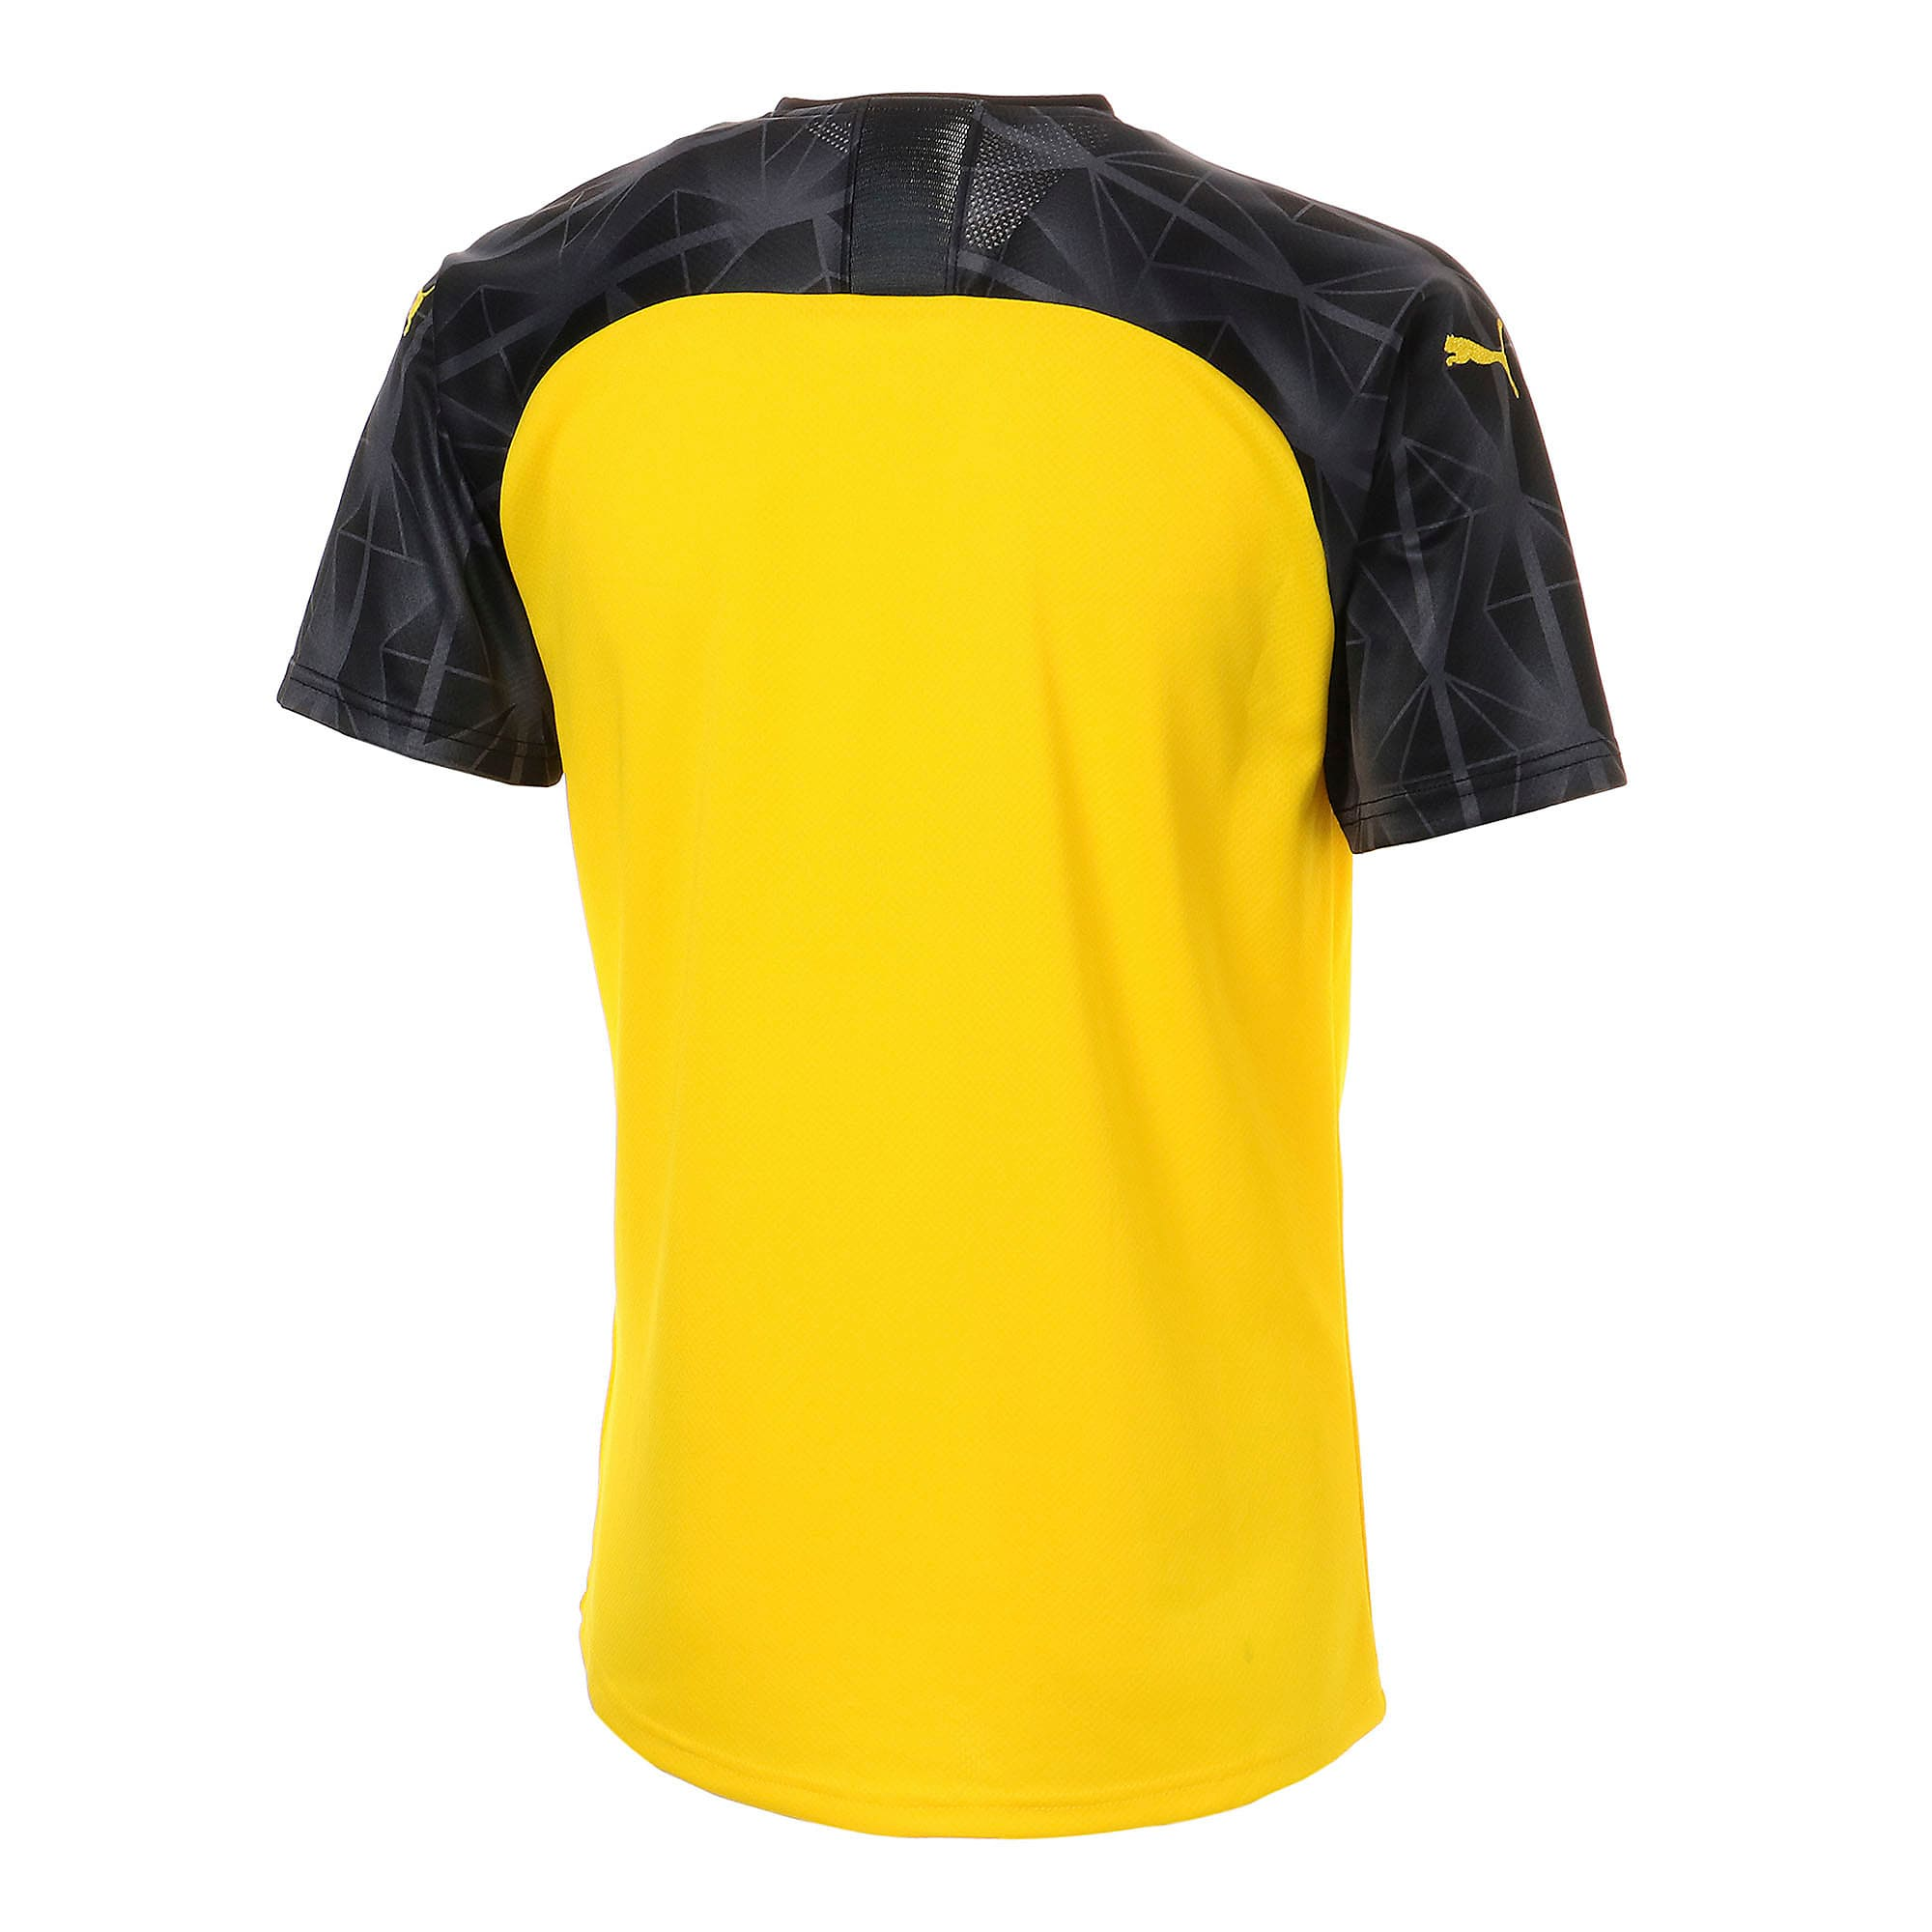 Thumbnail 3 of ドルトムント BVB SS カップ レプリカシャツ (半袖), Cyber Yellow-Puma Black, medium-JPN